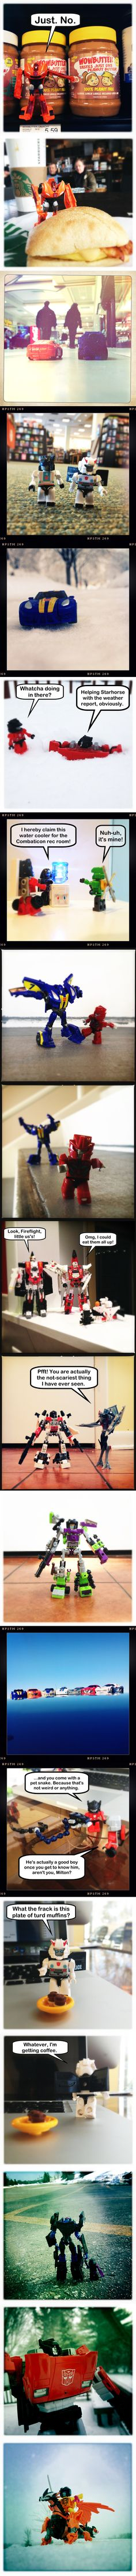 Random regular day that transformers do :D - Awww!!!! I love the Vehicon one ^w^